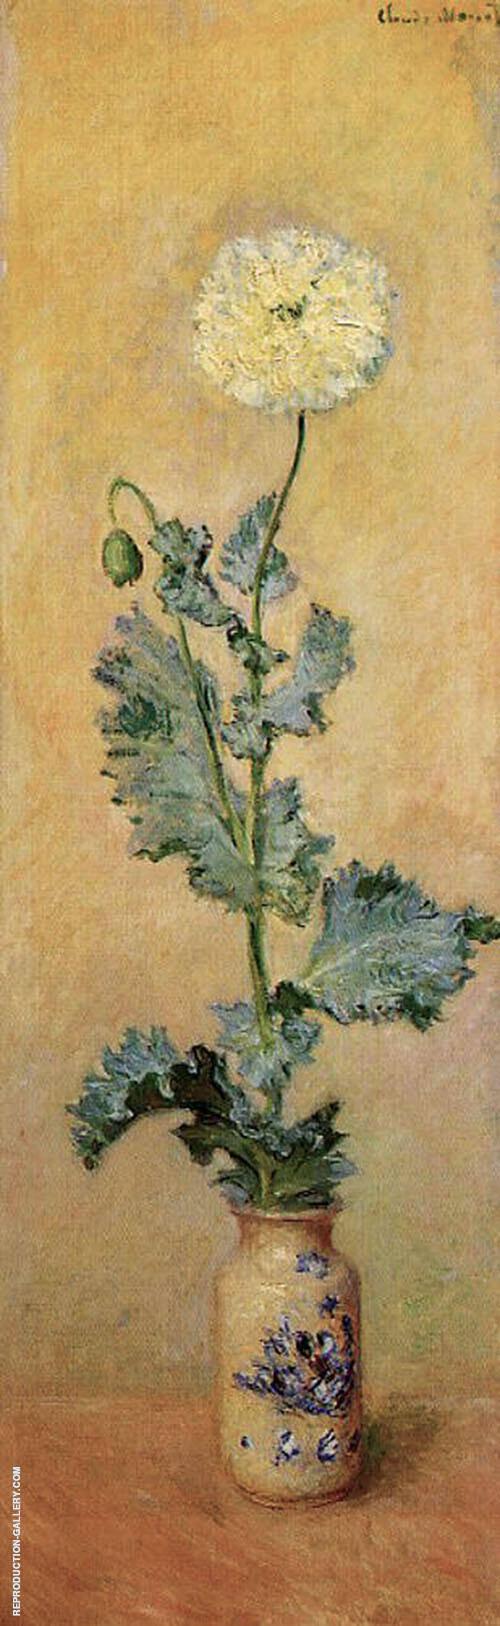 Wisteria 1917 2 By Claude Monet